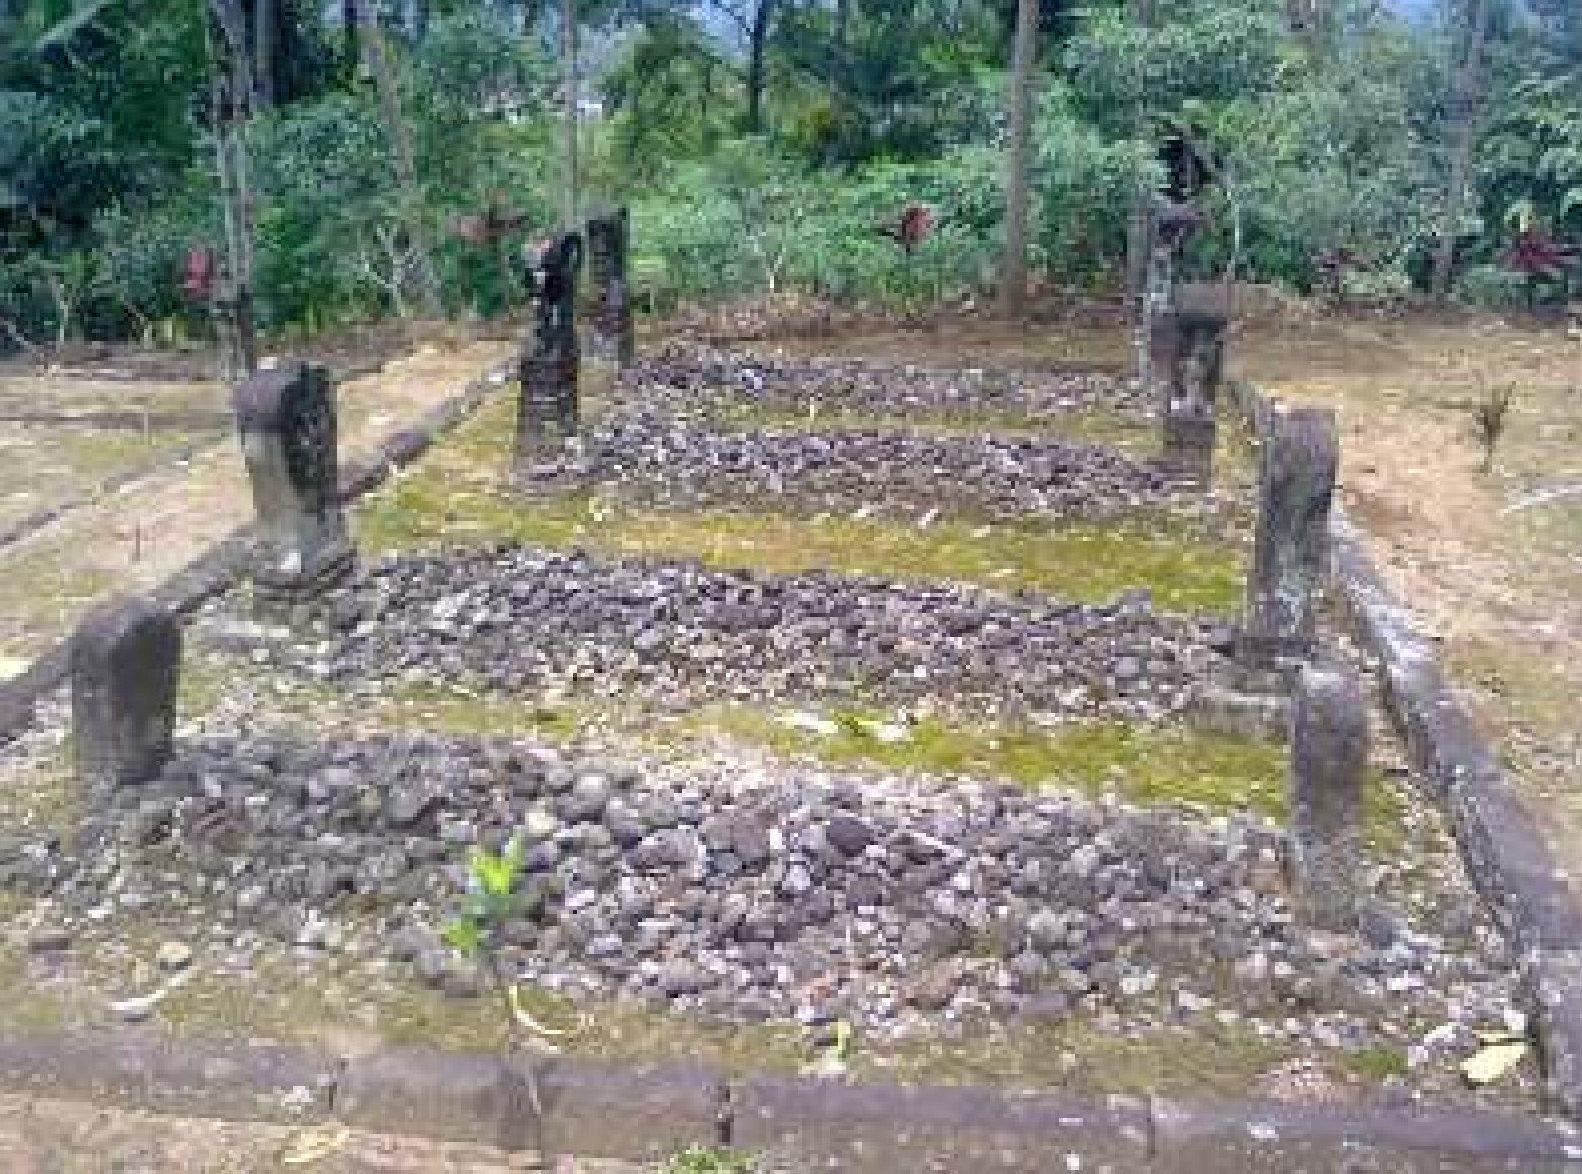 Makam Sayid Hasyim Ketinggring